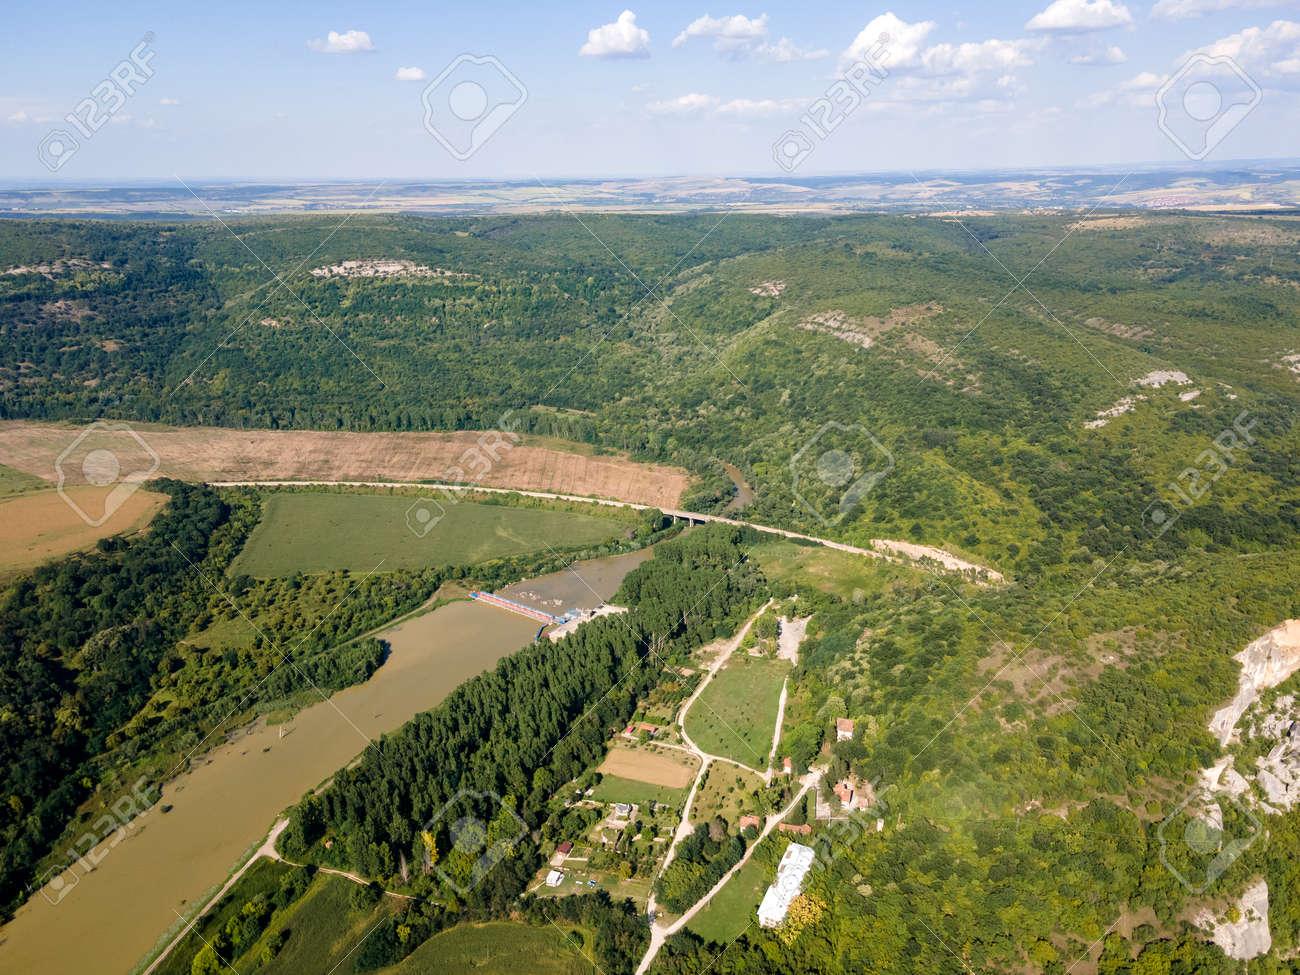 Aerial view of Iskar river, passing near village of Karlukovo, Balkan Mountains, Bulgaria - 157828711